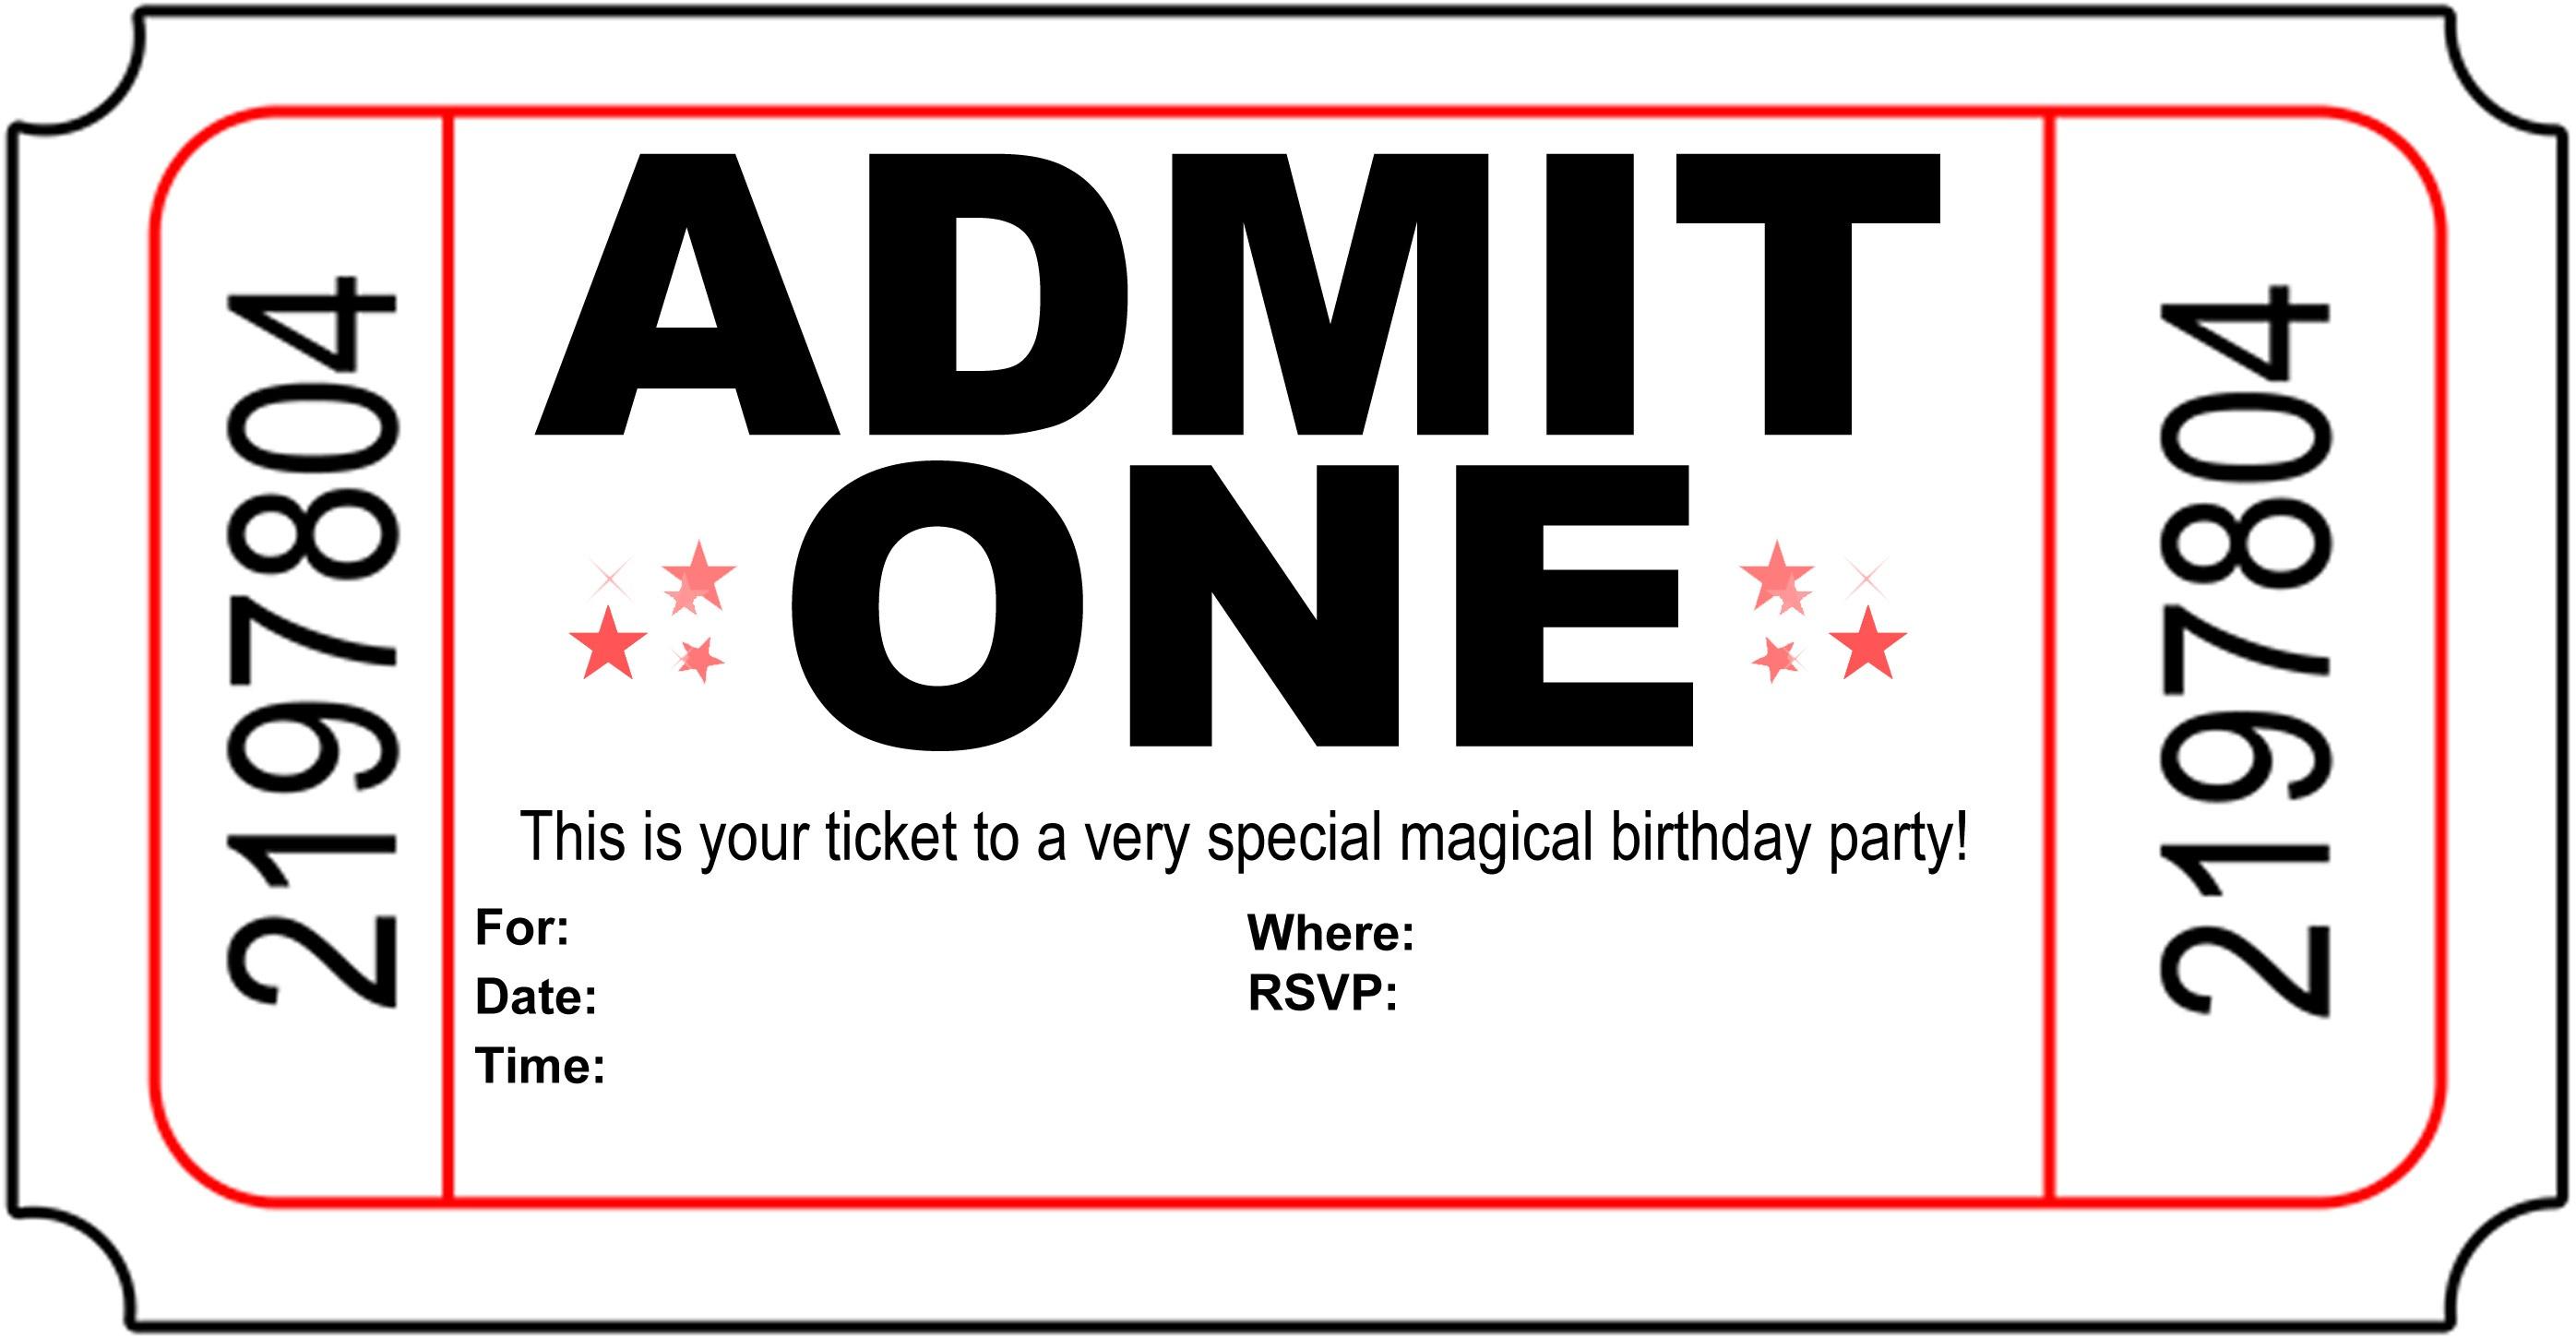 019 Template Ideas Free Movie Beautiful Ticket Printable - Free Printable Movie Tickets